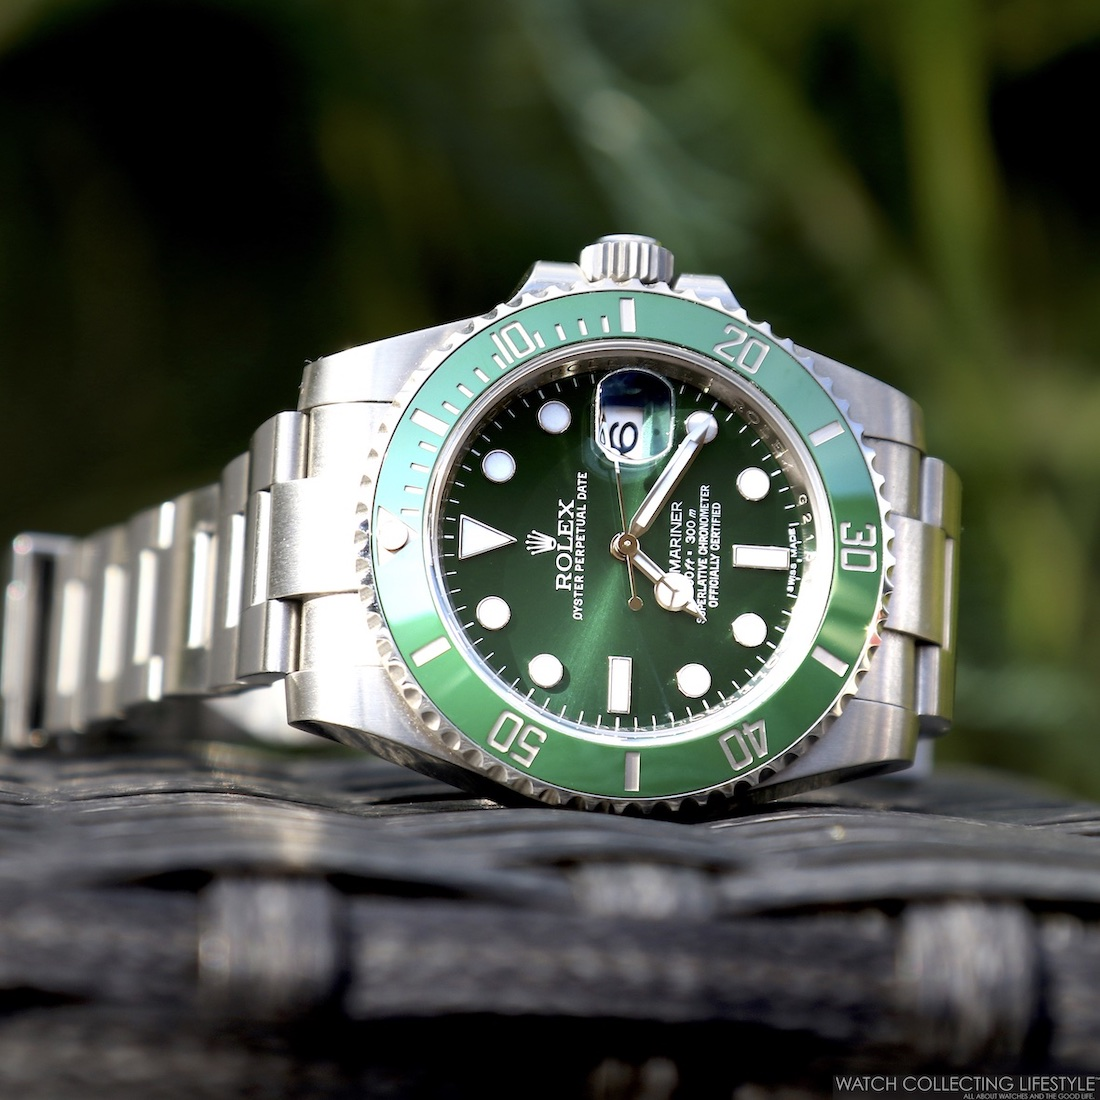 Rolex Submariner ref. 116610LV The Hulk